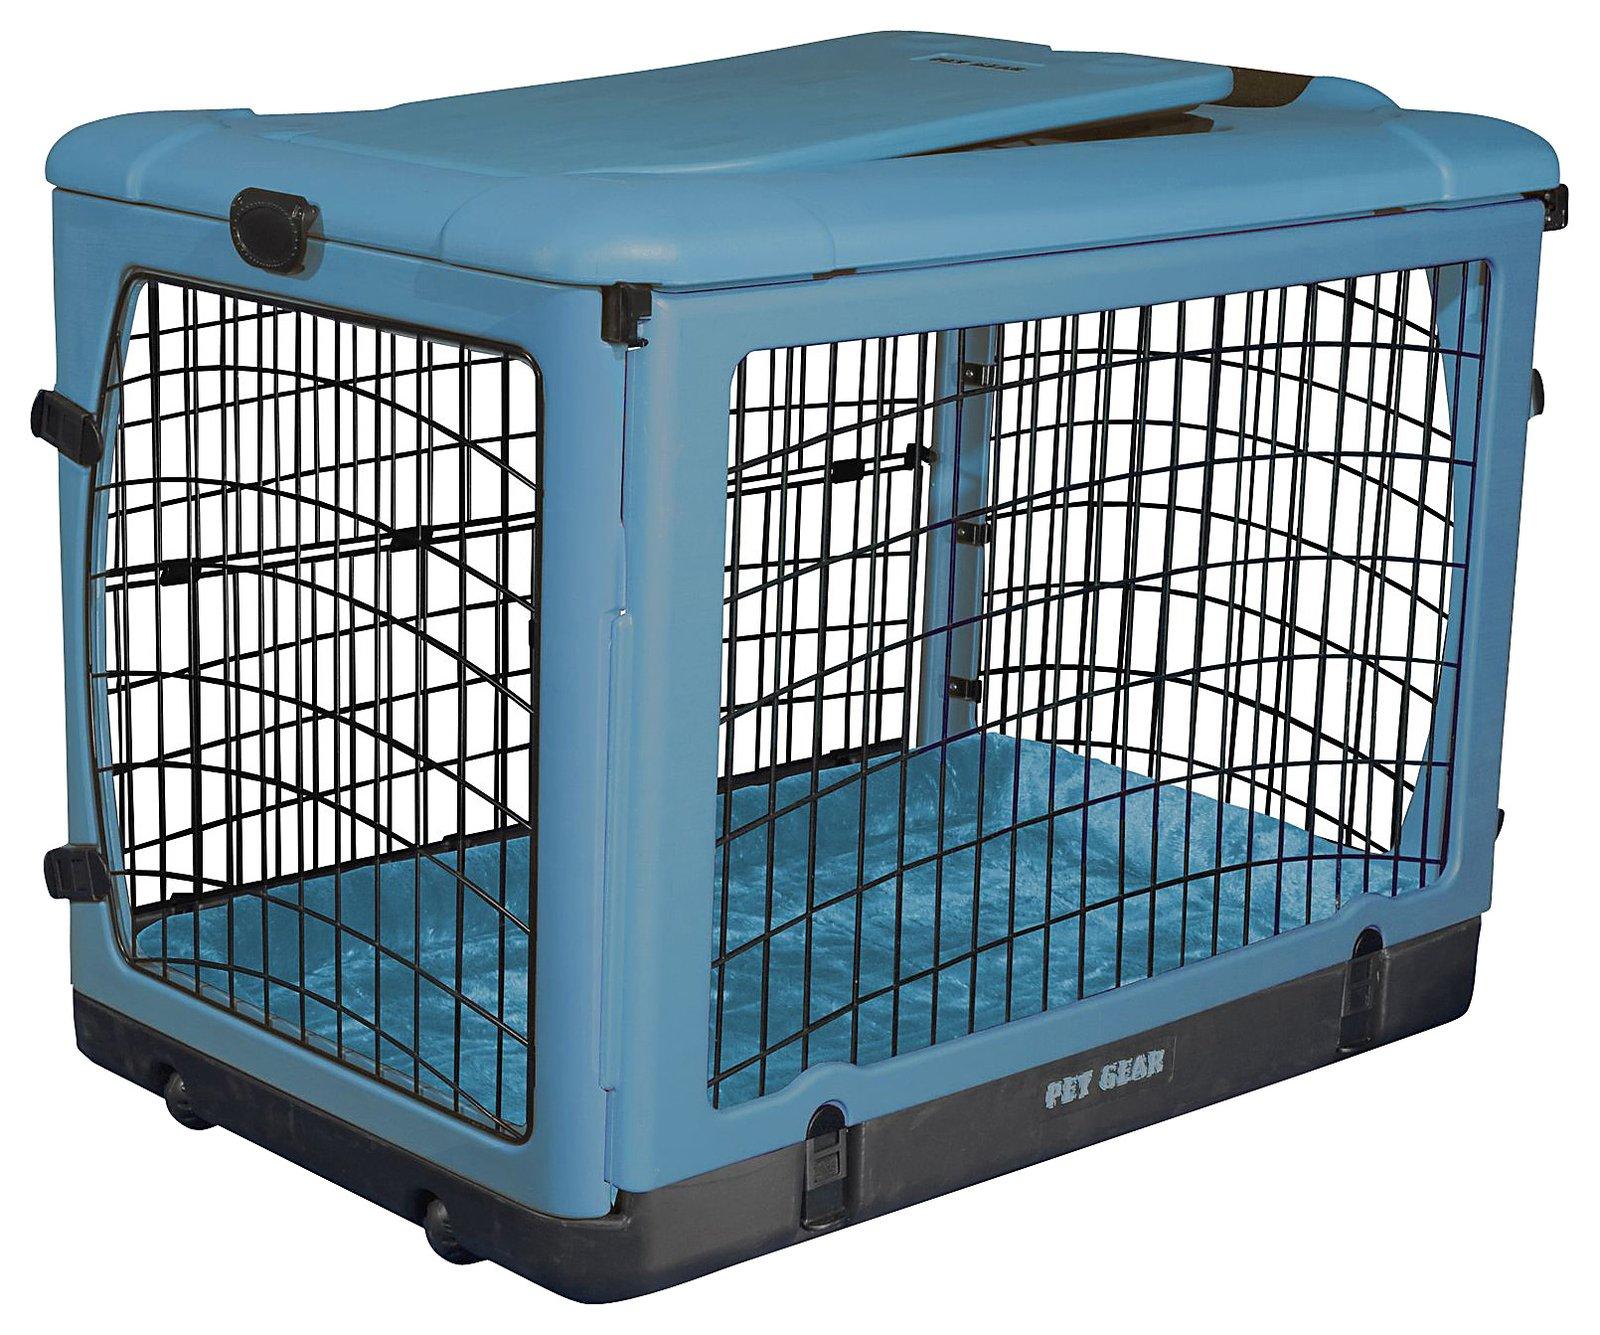 Amazon.com: JAULA para MASCOTAS de PET GEAR THE OTHER DOOR con BASE AFELPADA y BOLSA para TRANSPORTAR modelo Ocean Blue 30 Lbs.: Health & Personal Care